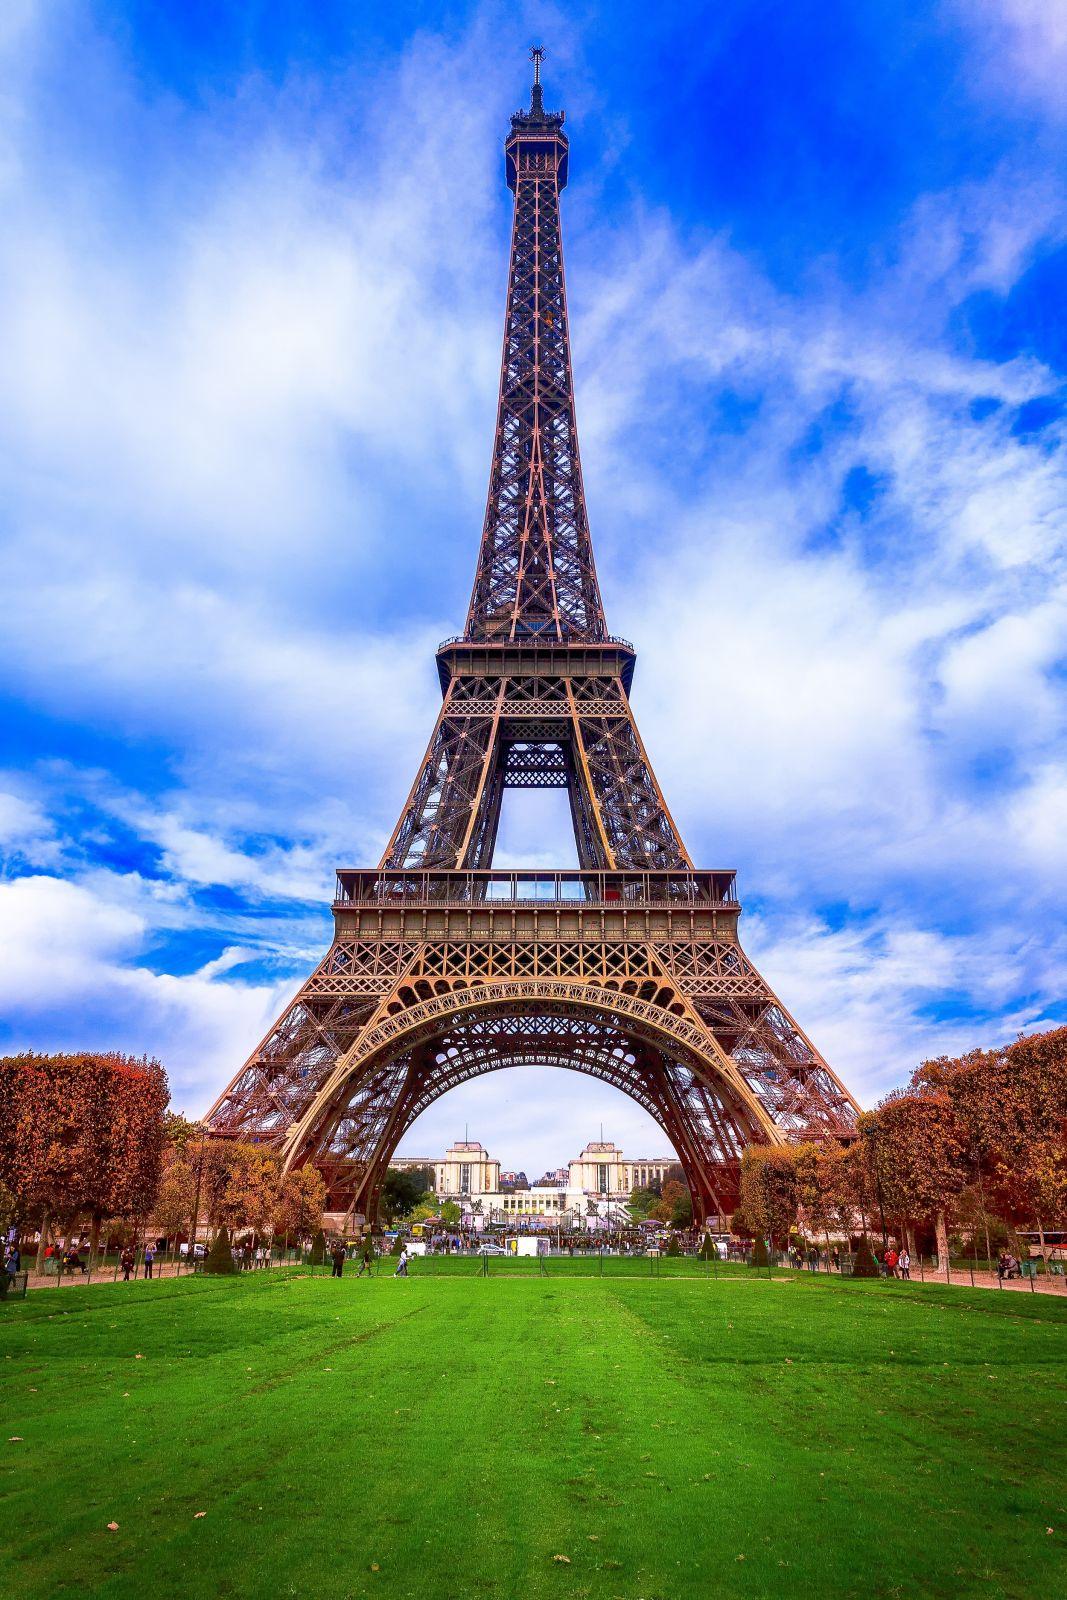 بالصور صور لبرج ايفل , اجمل صور لبرح ايفل بفرنسا 3314 17